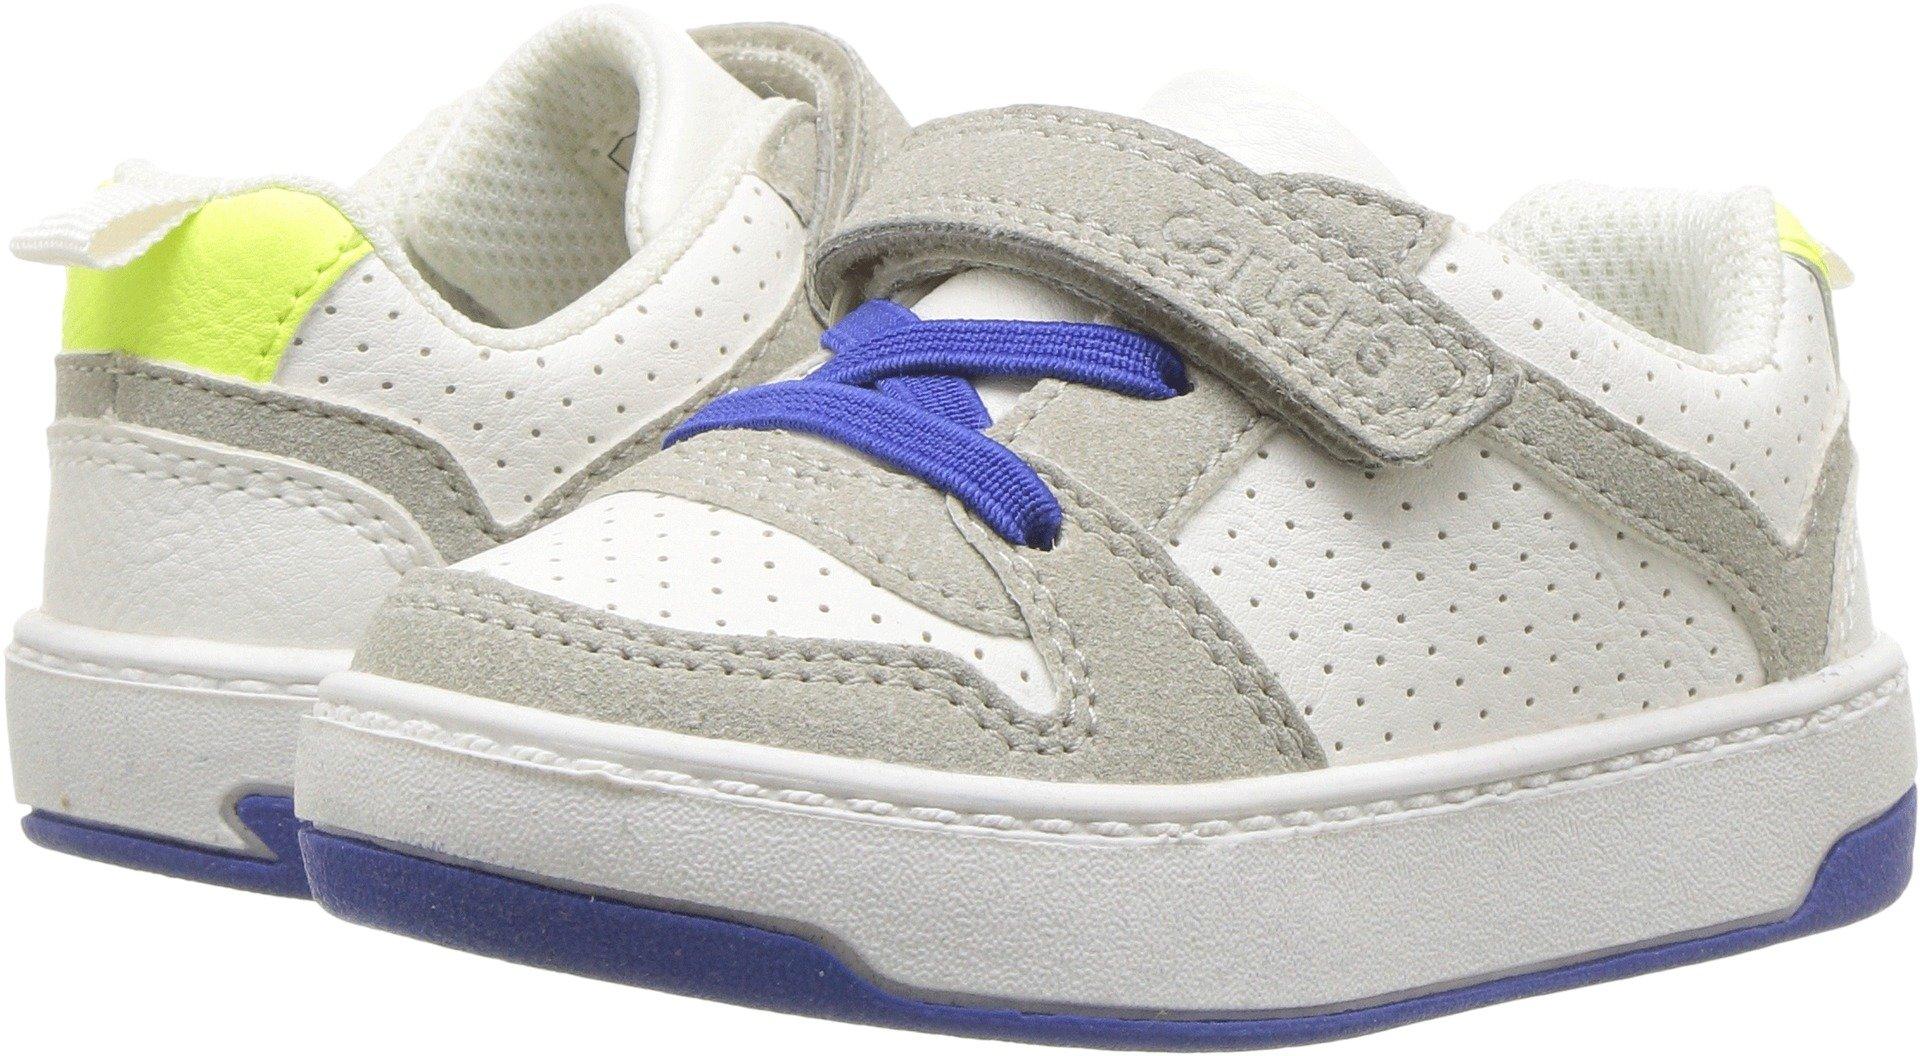 Carter's Boys' Vick Athletic Sneaker, White, 5 M US Toddler